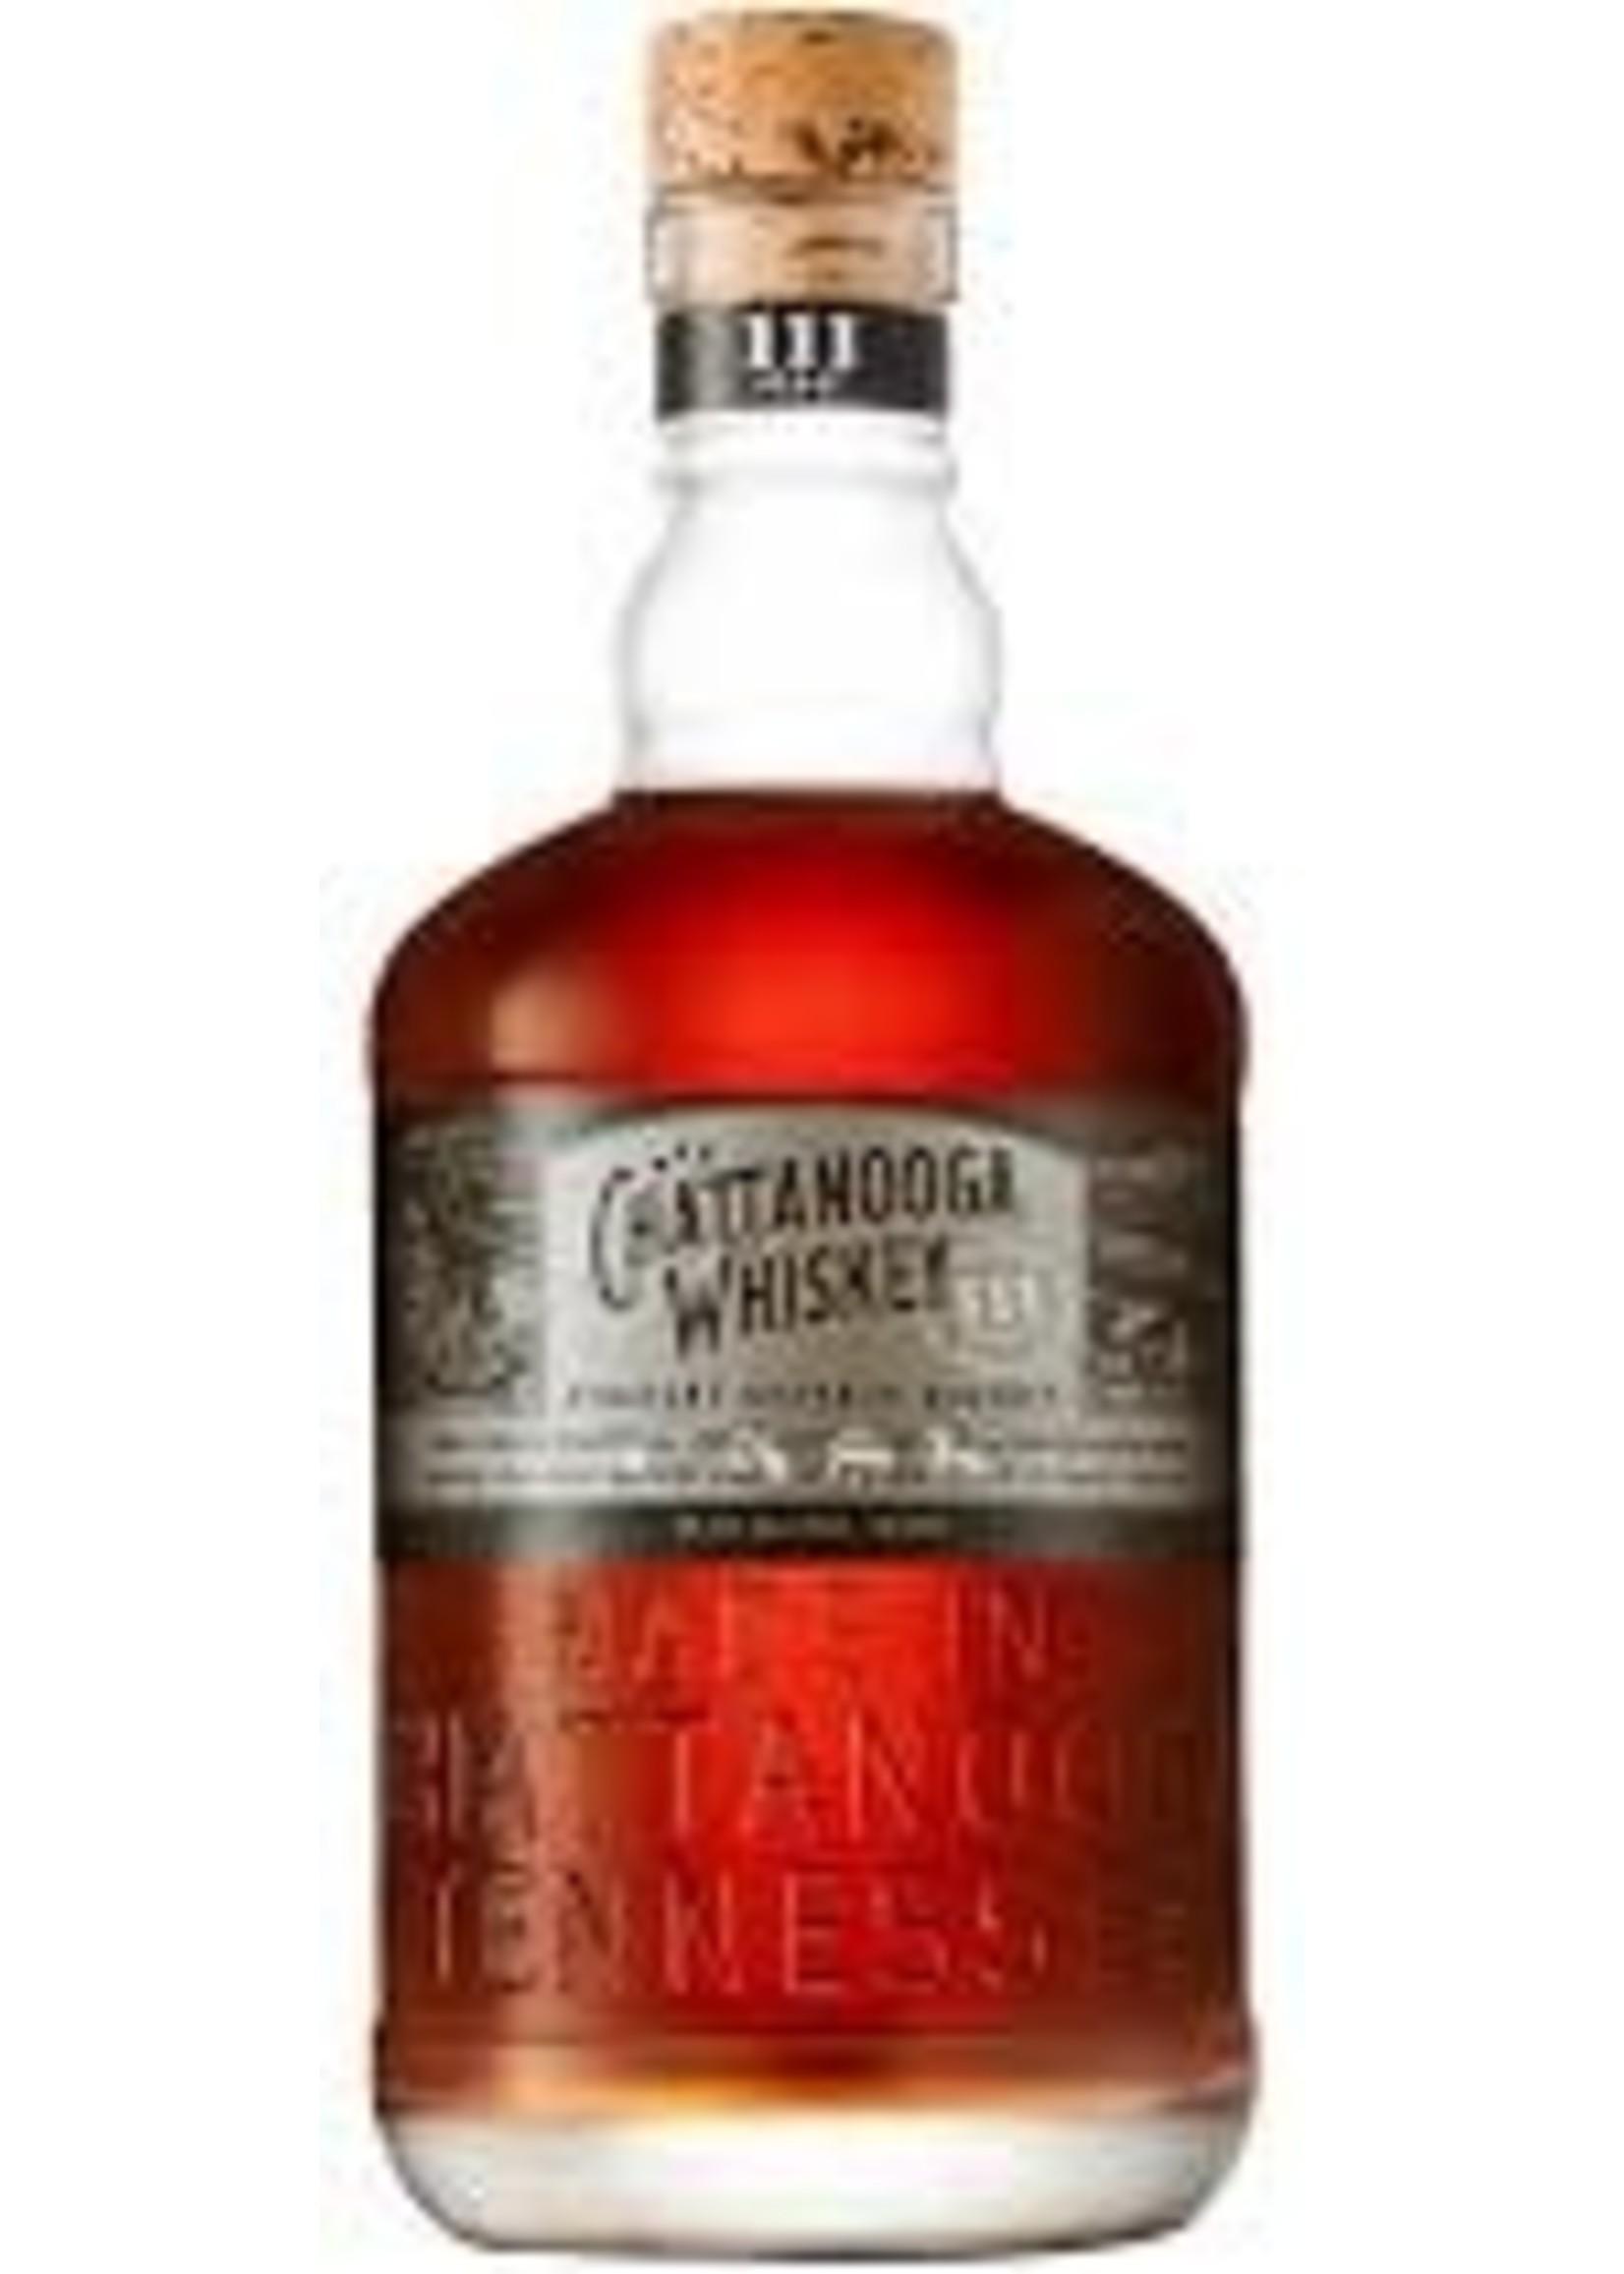 Chattanooga Whiskey Straight Bourbon 111 PF 750ml